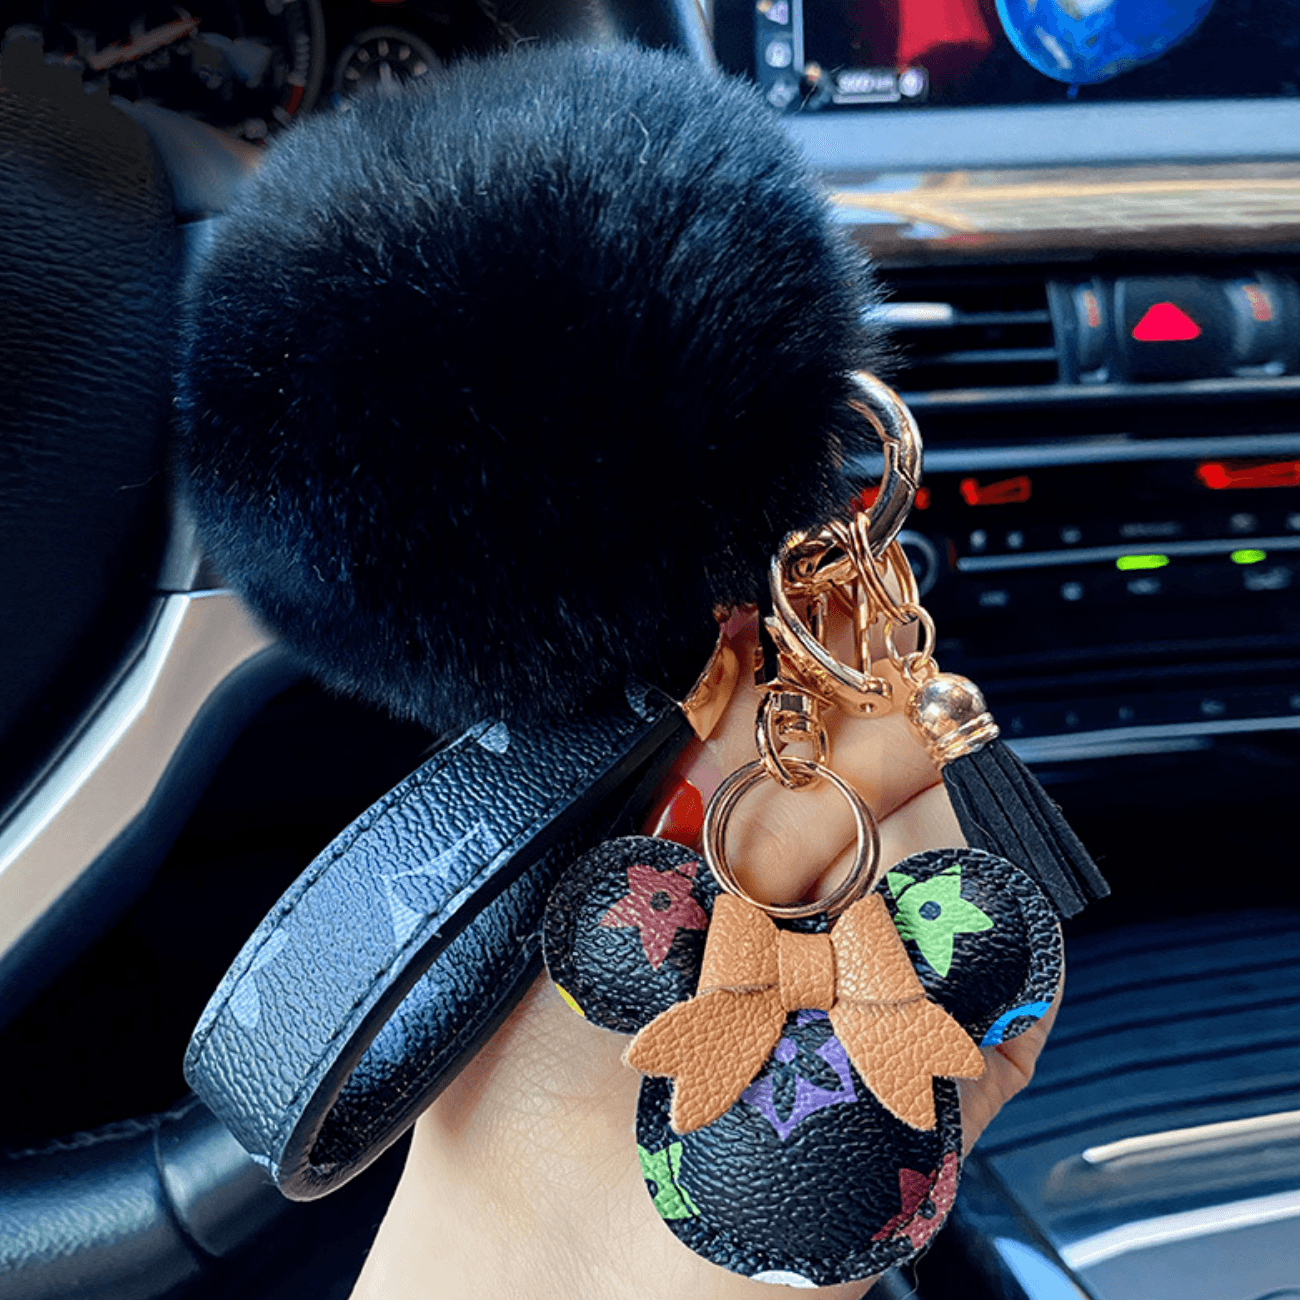 Original Cartoon Kawaii Keychain Cute Bag Pendant Fashion Couples Accessories Personality Car Plush Keychain